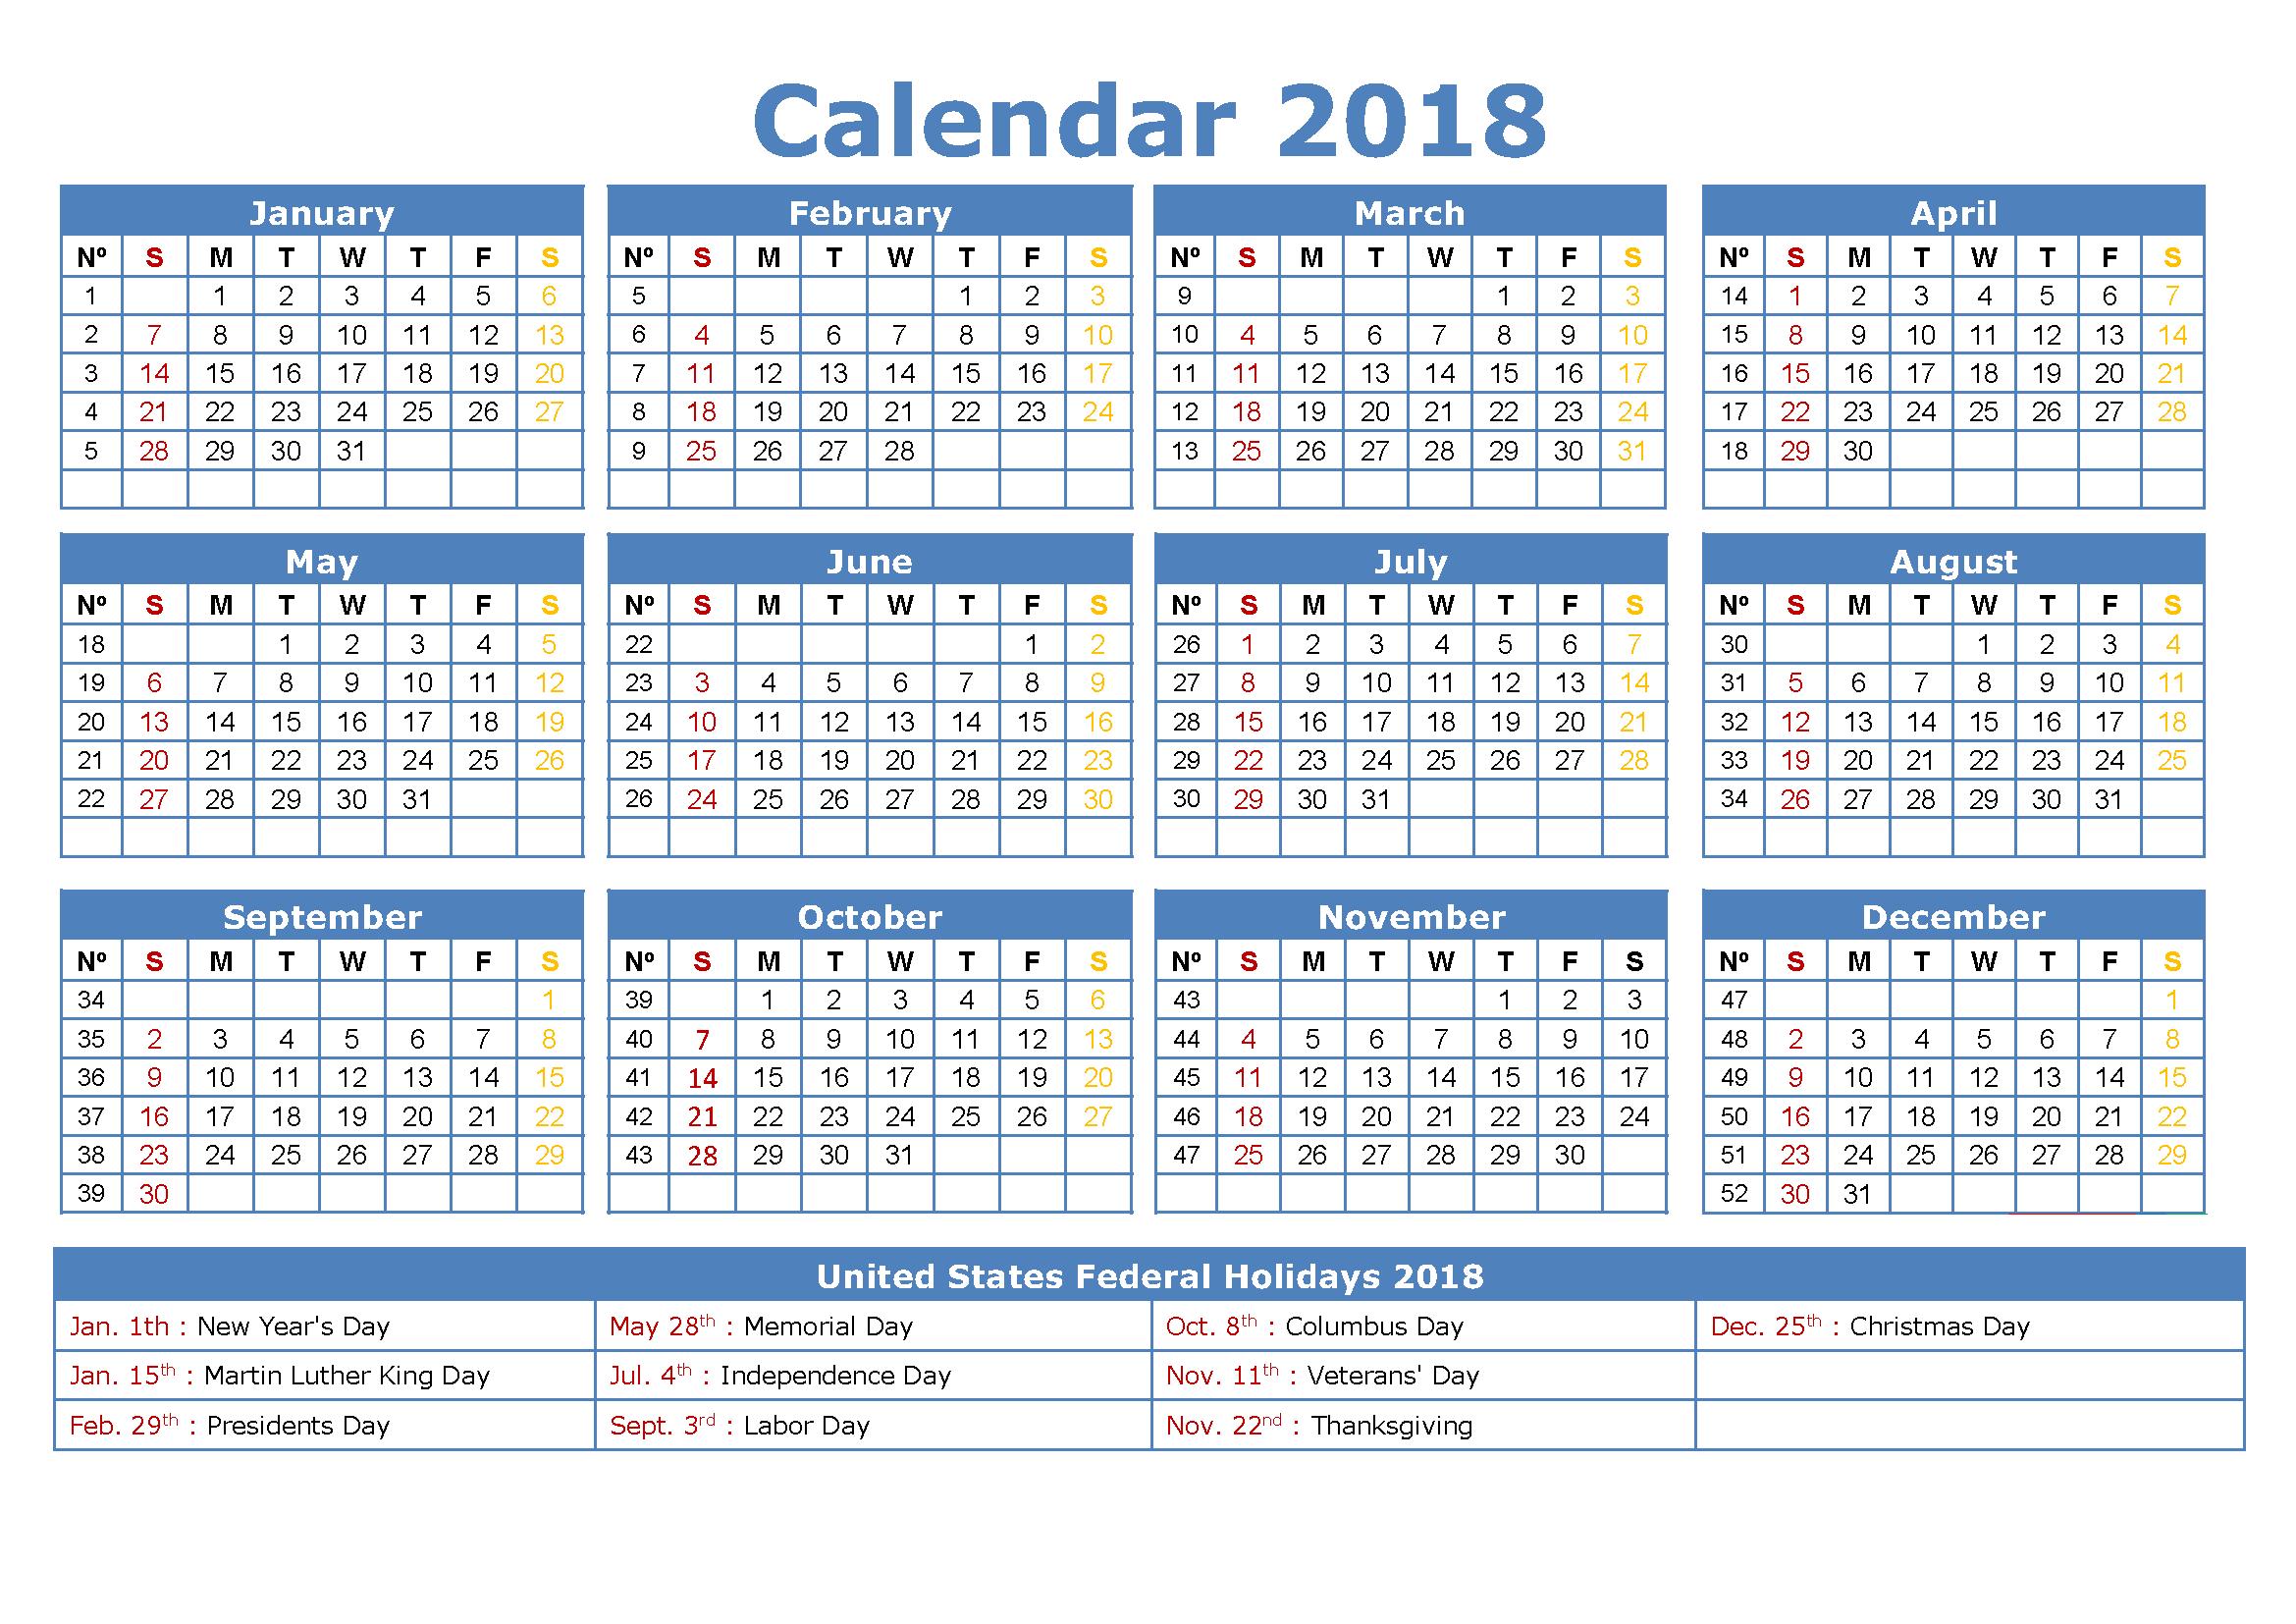 2018 Calendar with Holidays